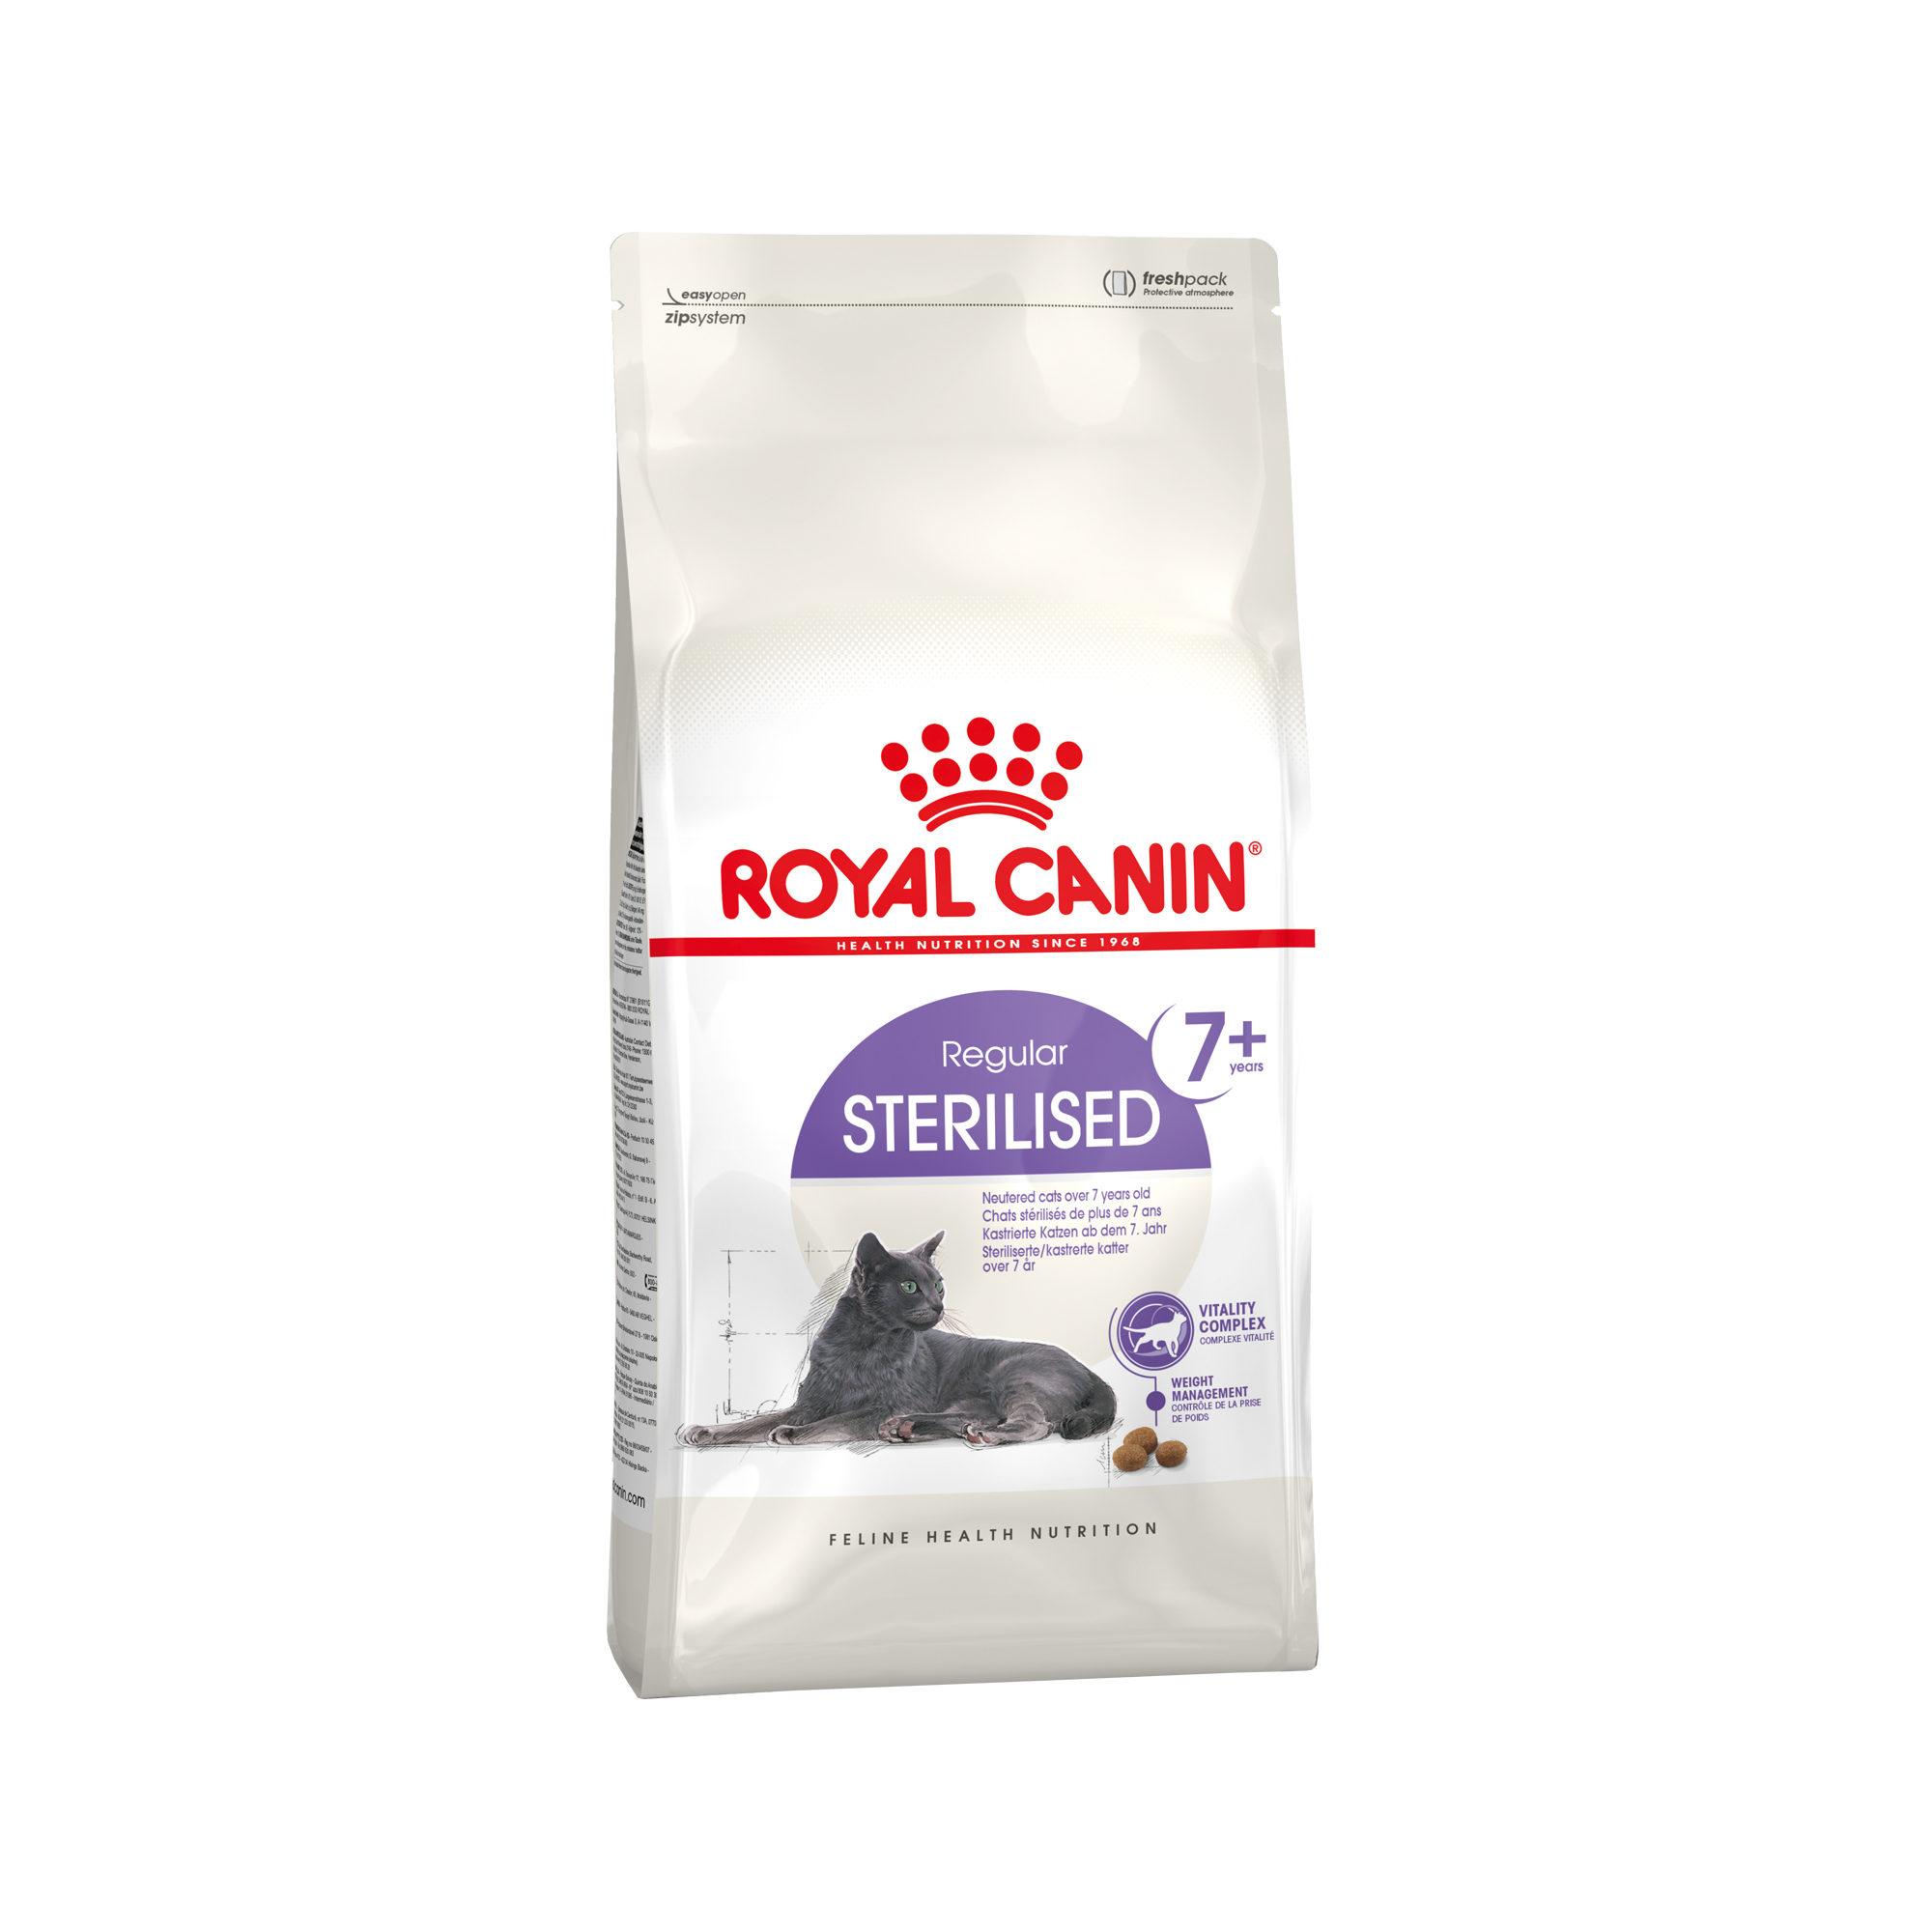 Royal Canin Sterilised 7+ Katzenfutter